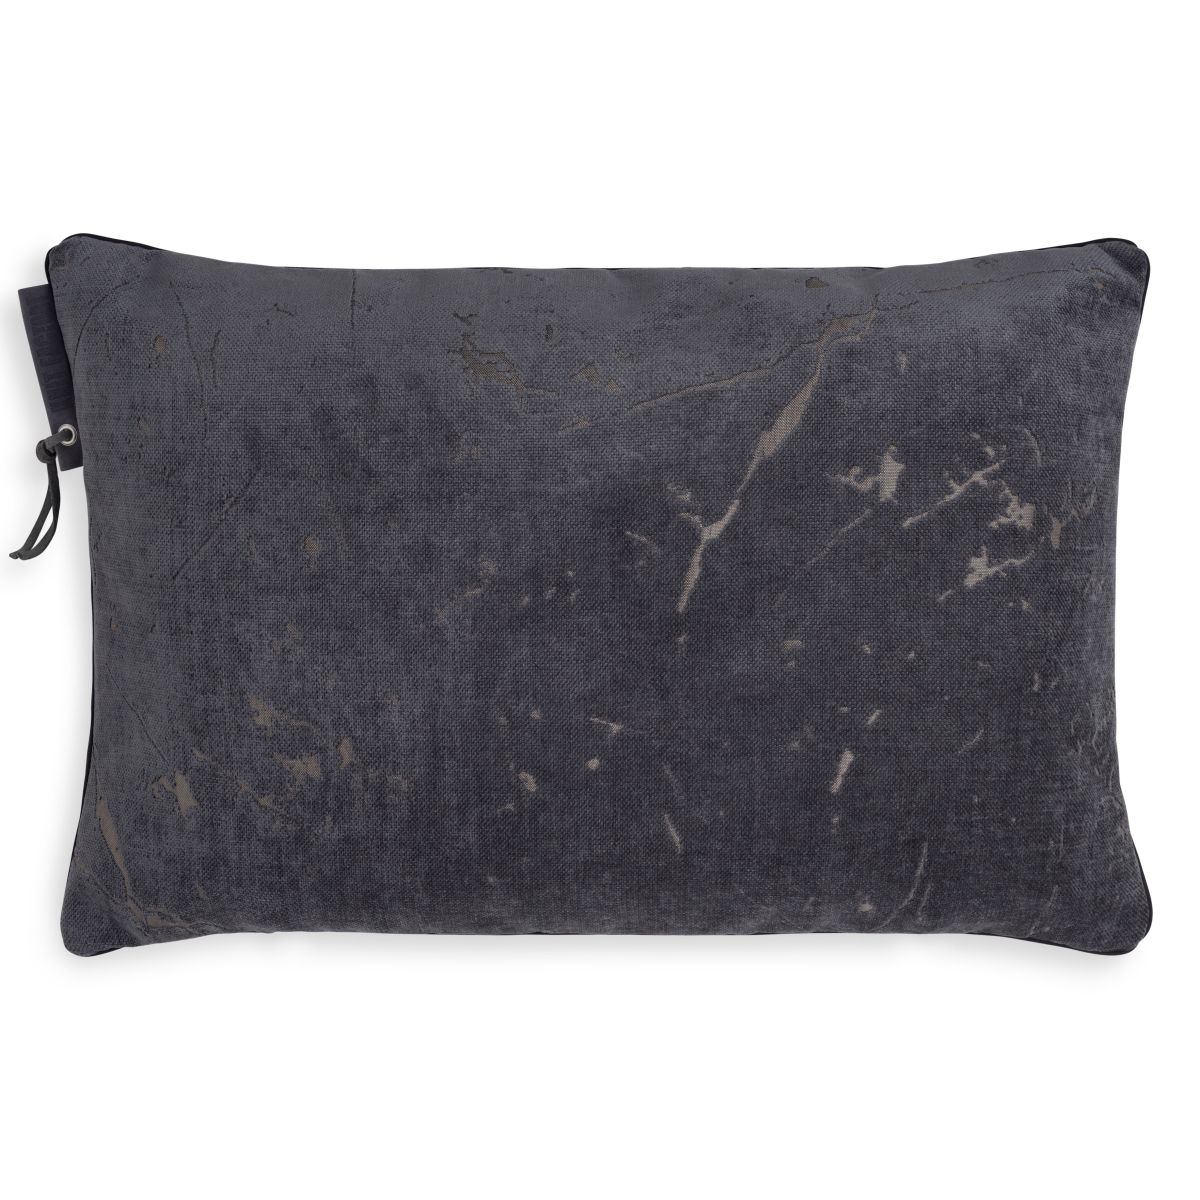 james cushion anthracite 60x40